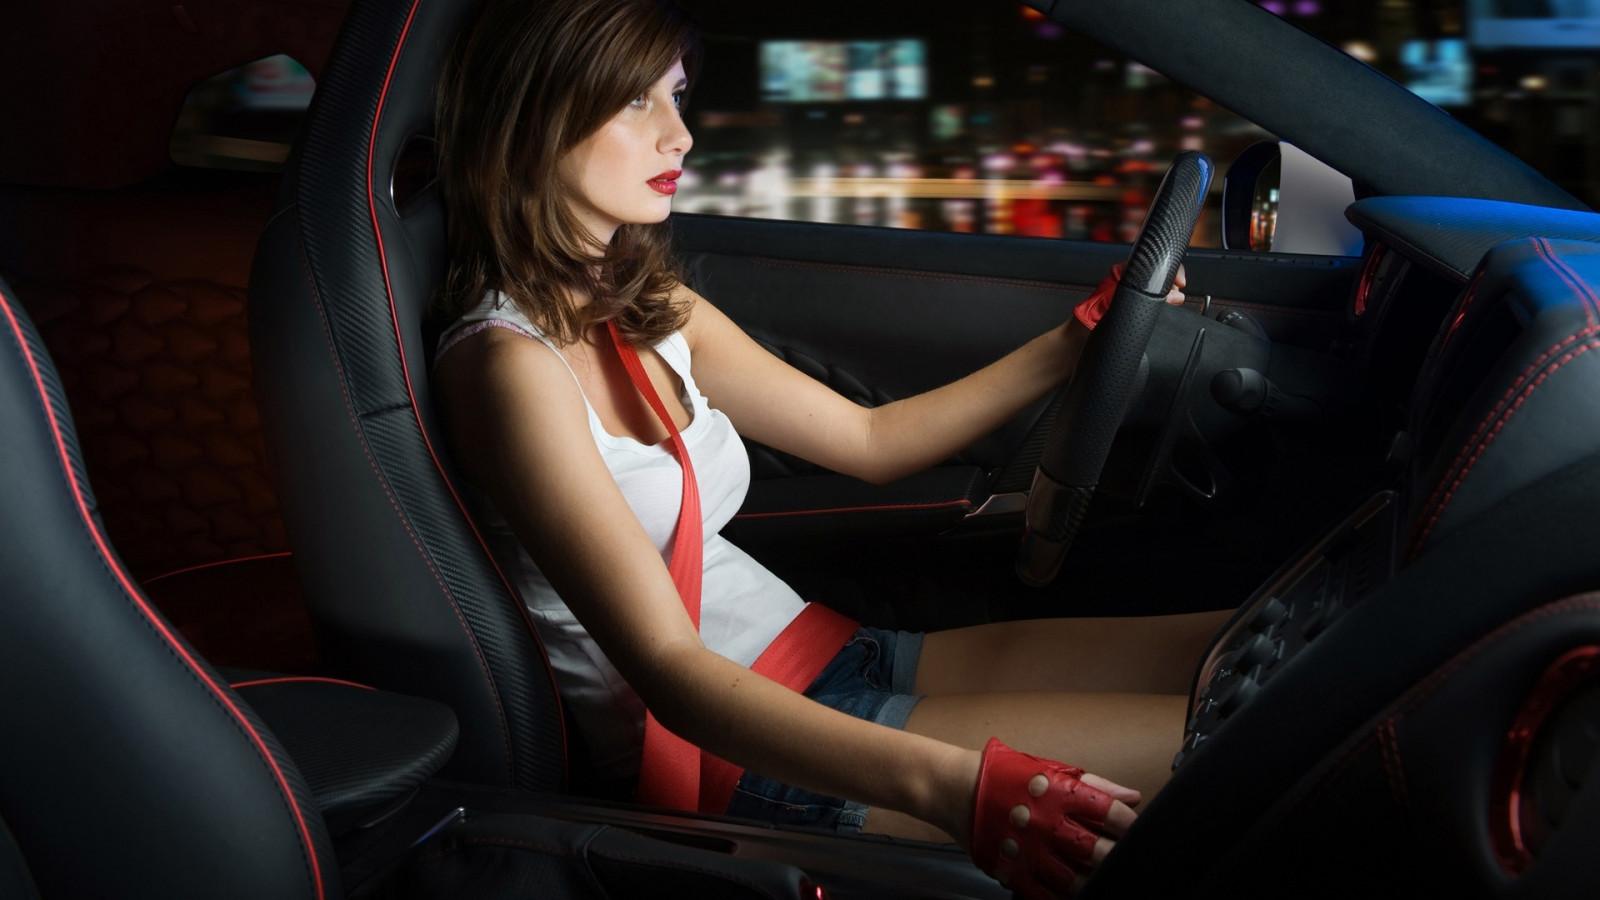 Девушки за рулем своих автомобилей фото